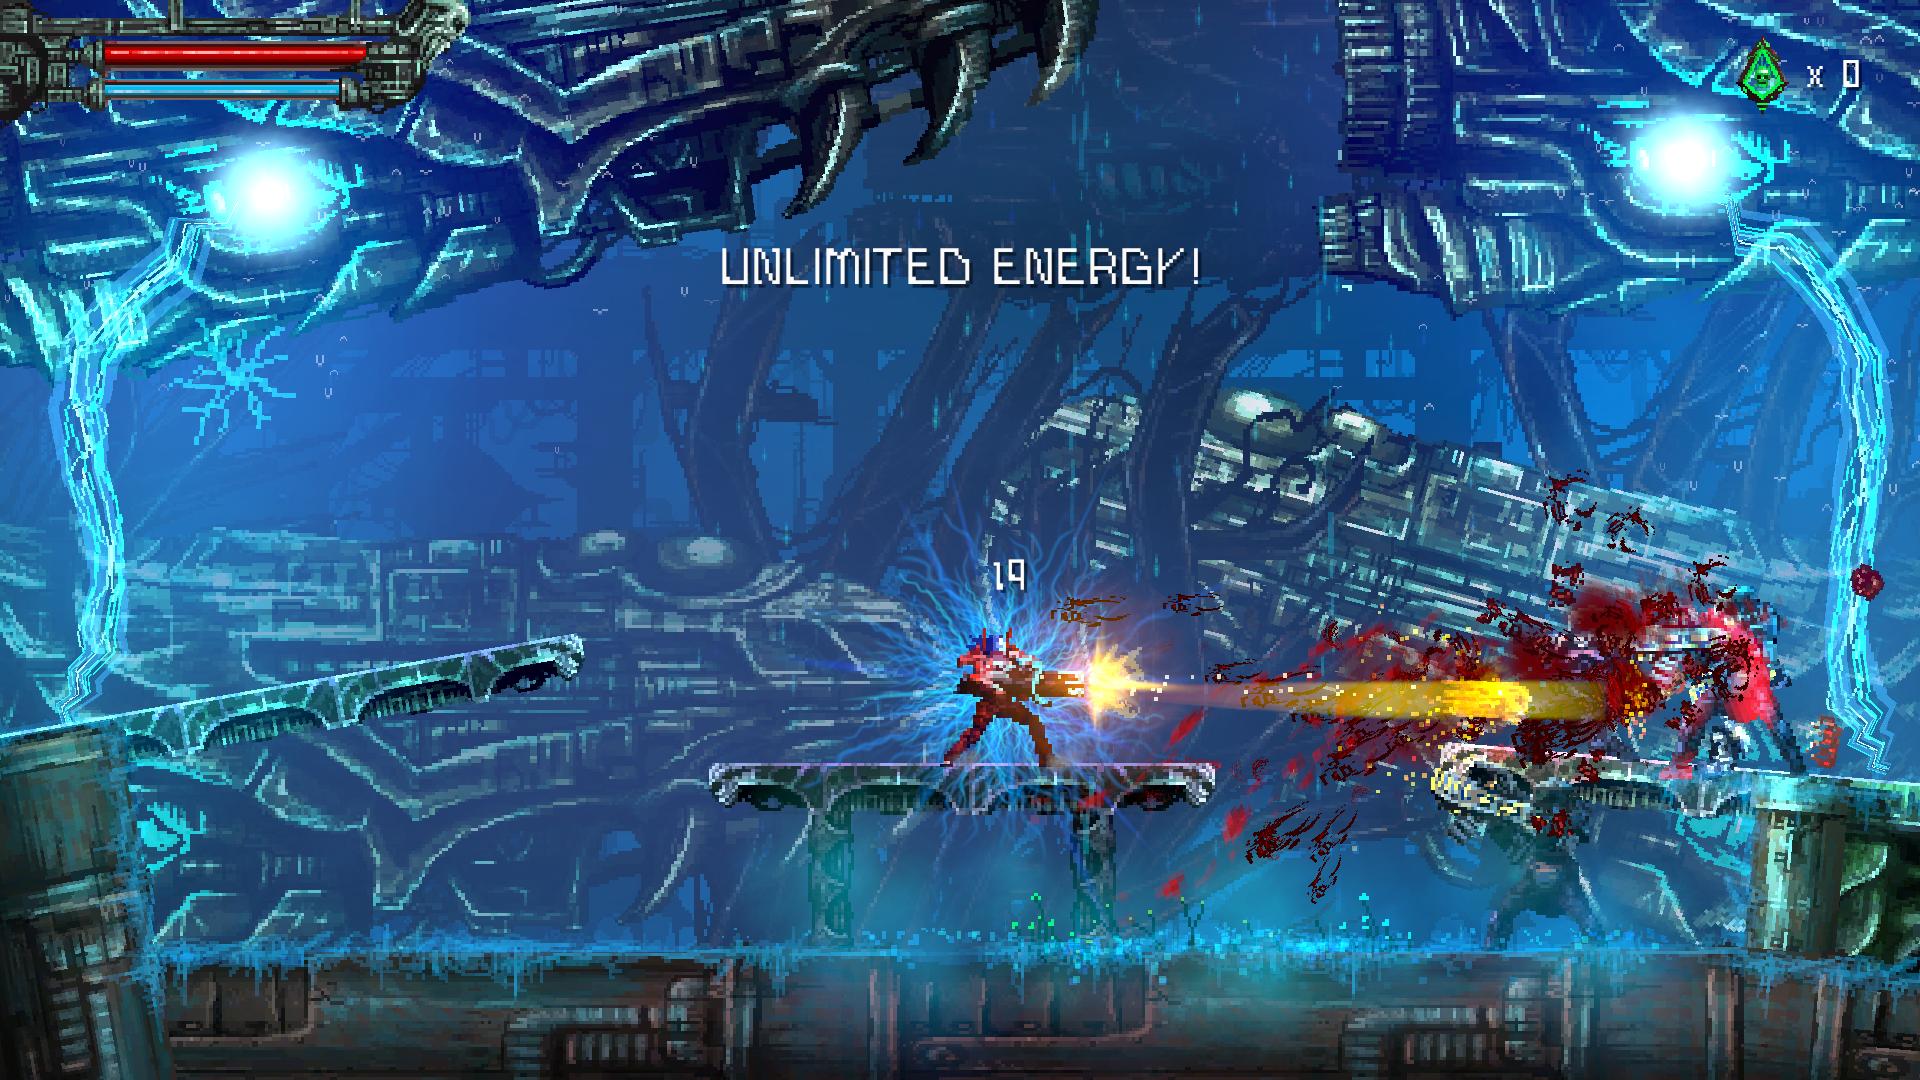 Upcoming Heavy Metal Space Saga Valfaris Launches Free Demo Gameology News